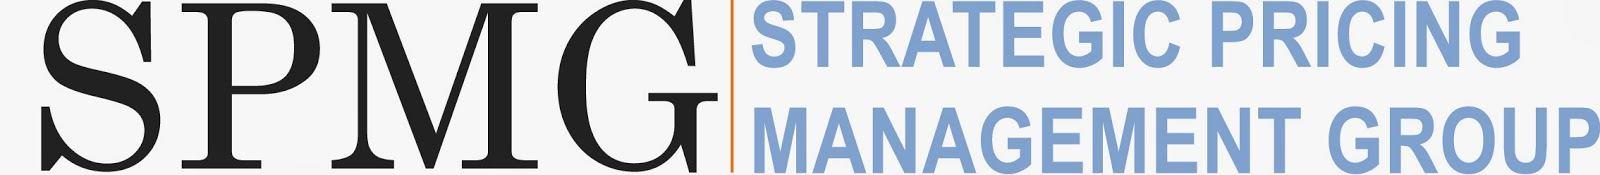 Strategic Pricing Management Group (SPMG) Logo